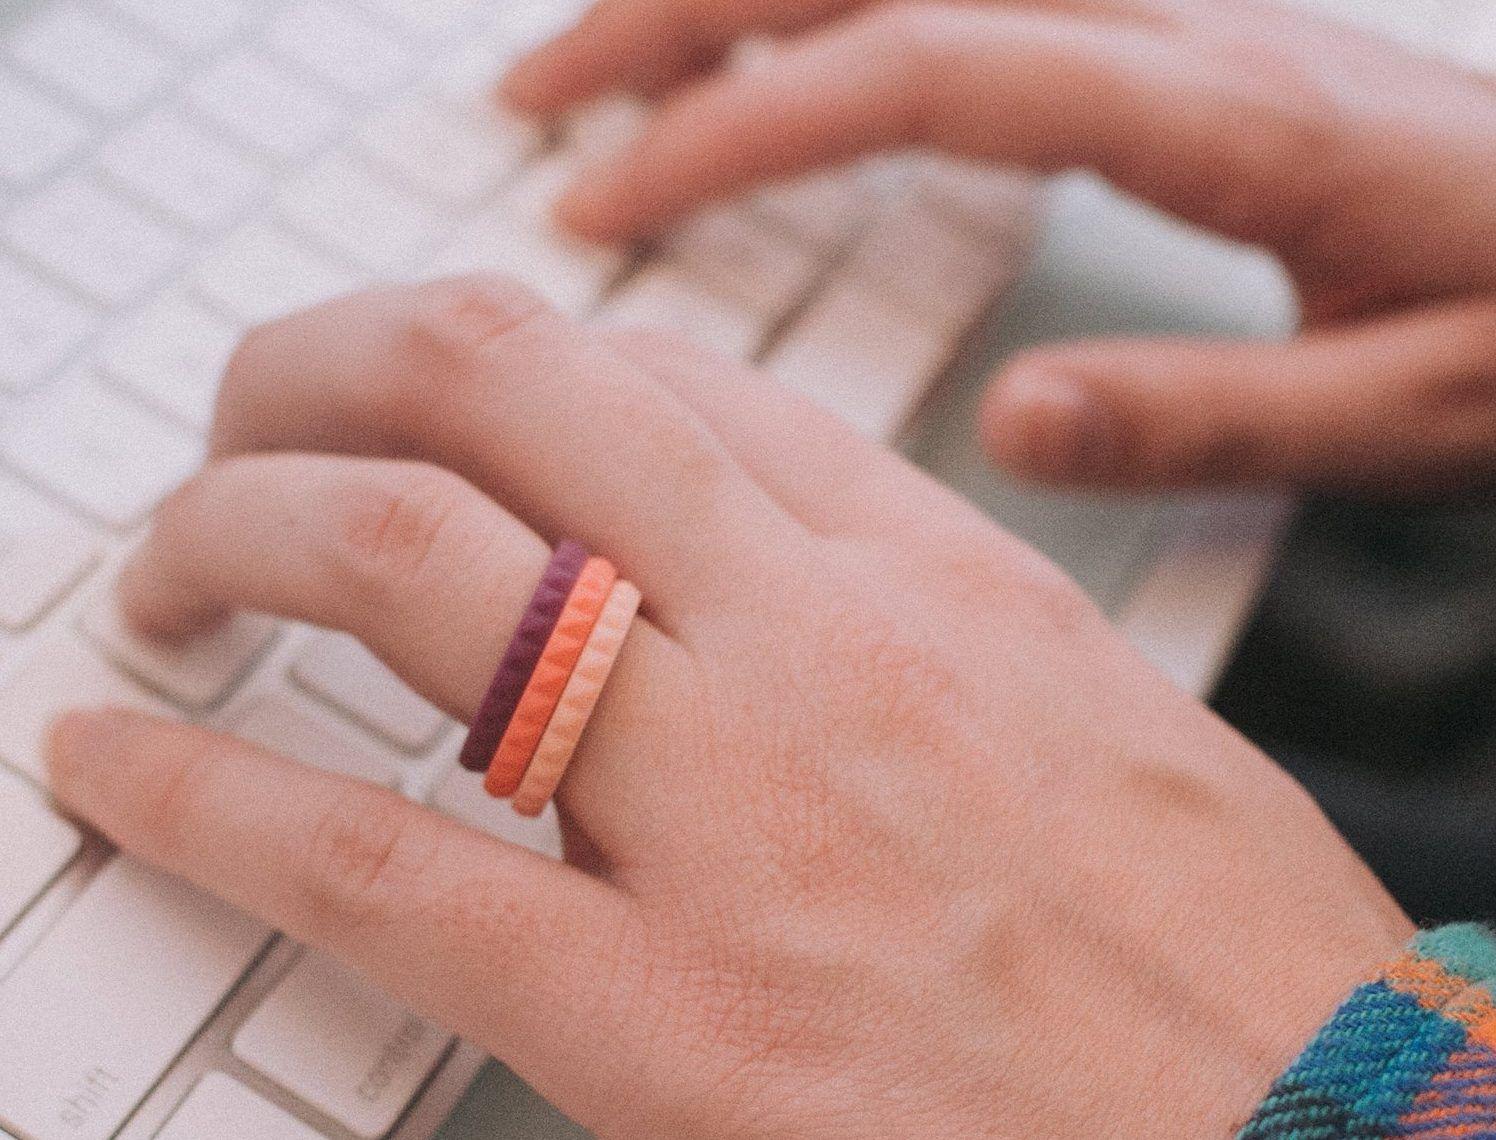 Silicone Wedding Rings | Colorful weddings, Handmade wedding and ...